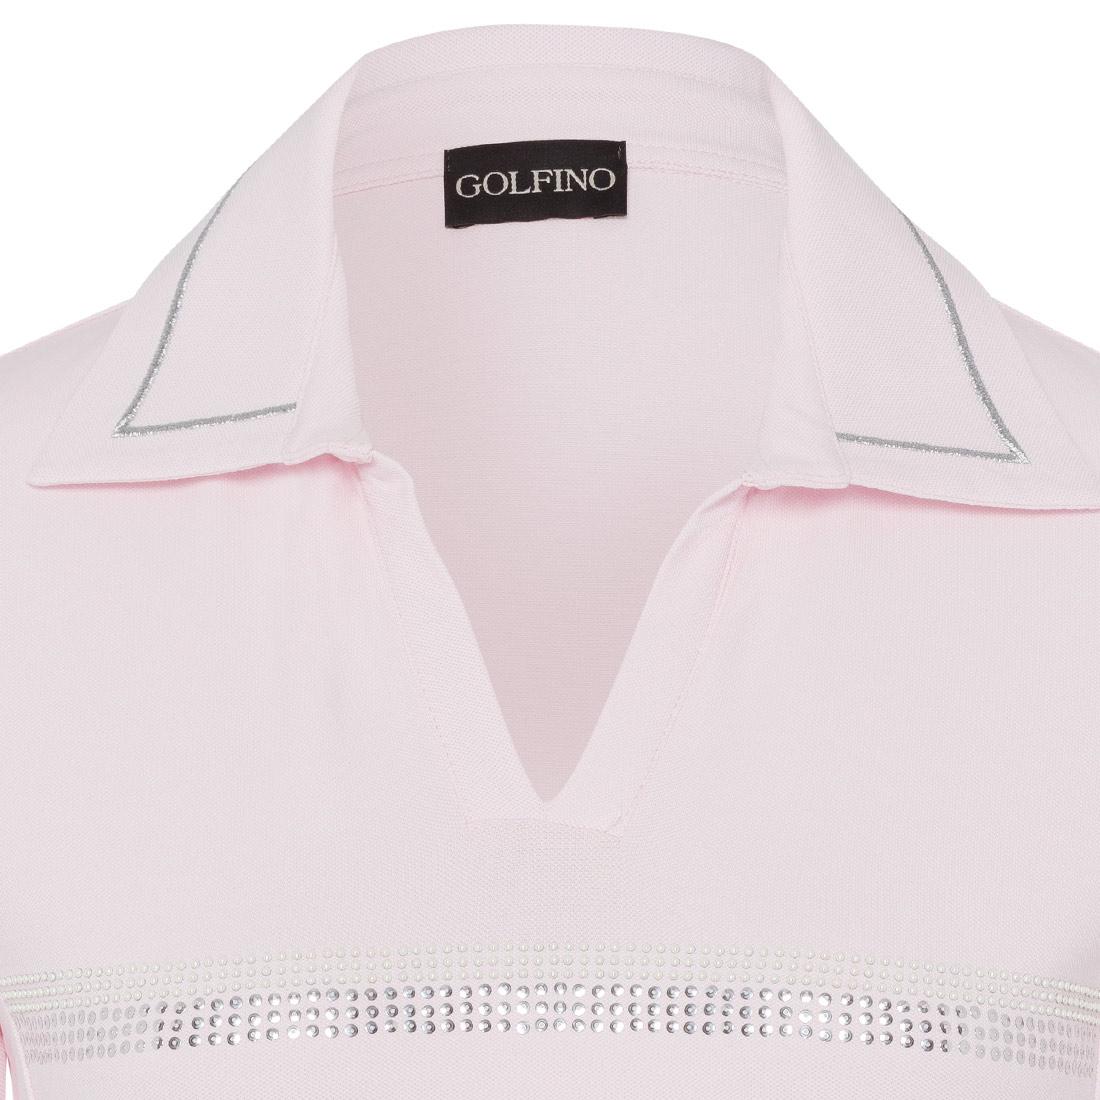 Damen Shirt mit Glitzerdekor